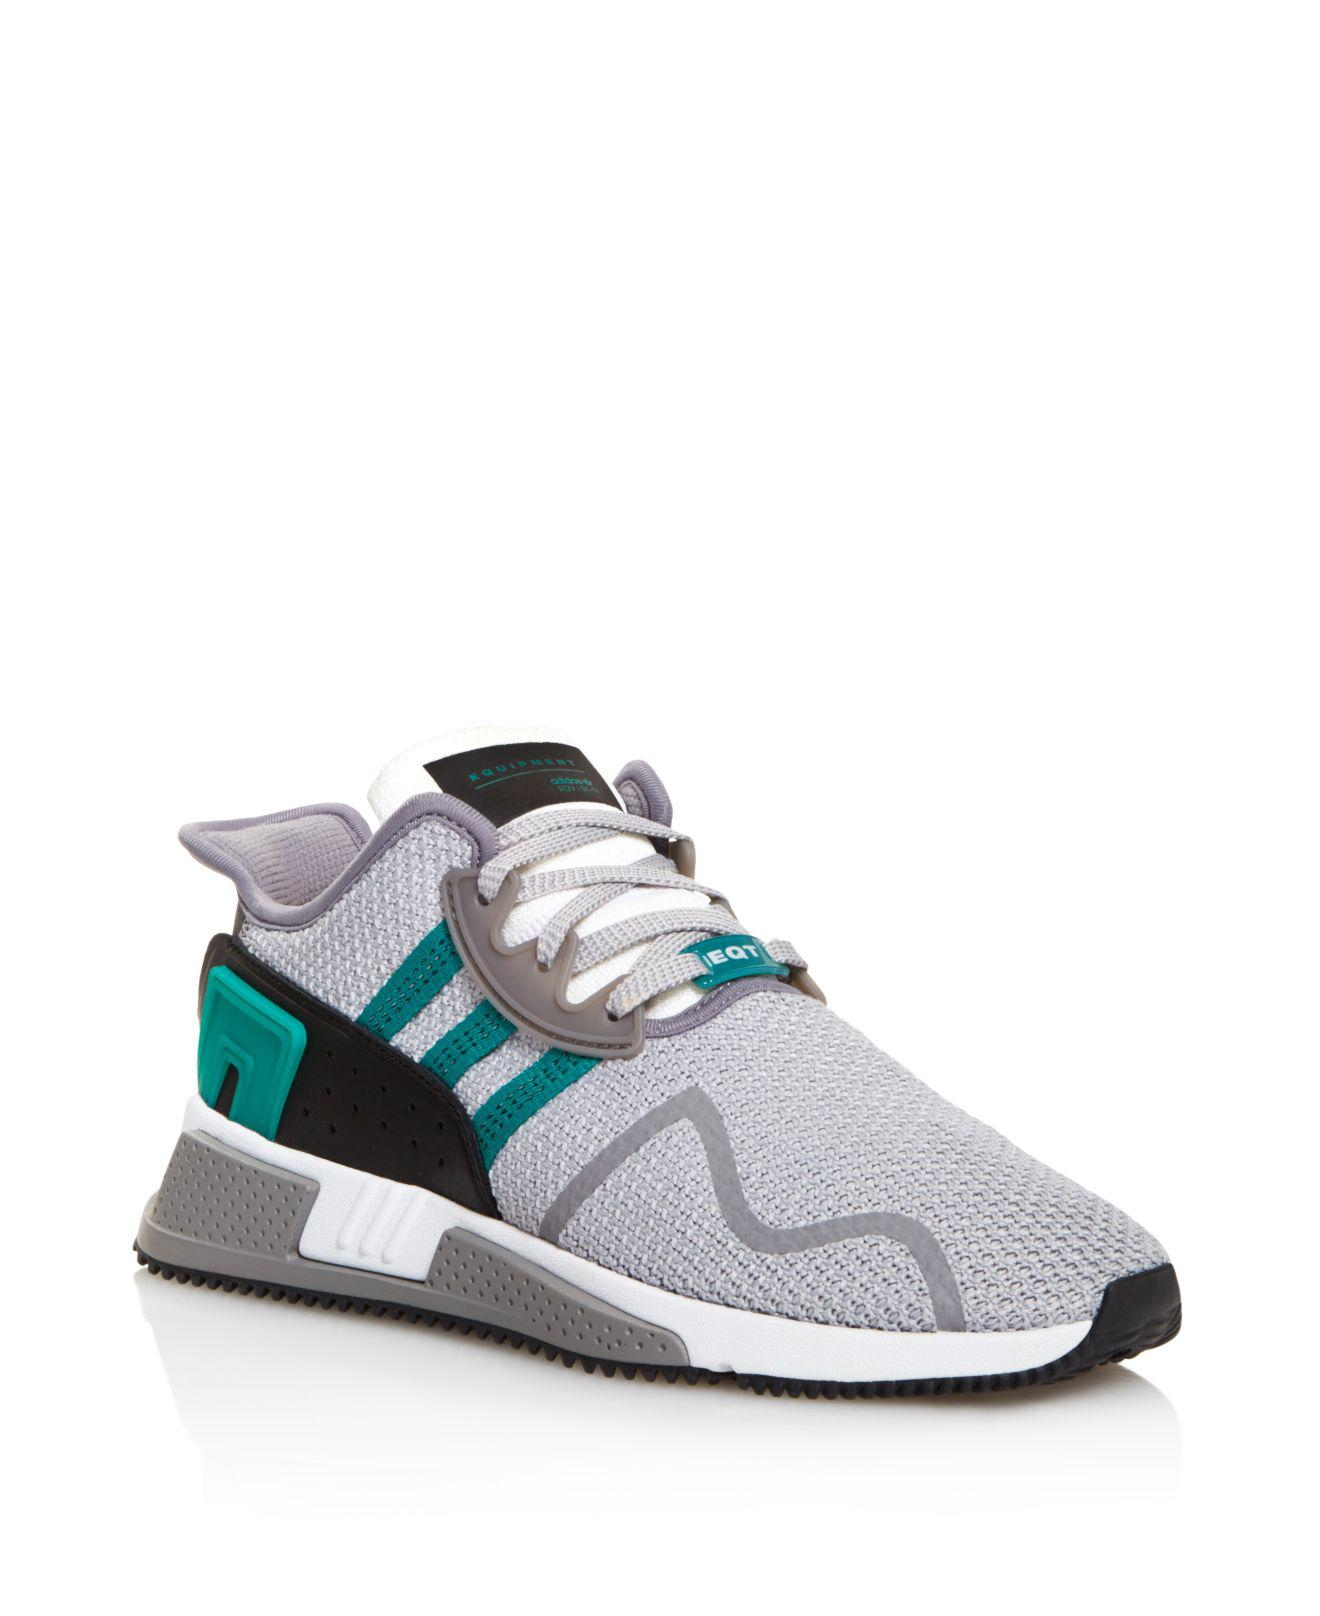 adidas Men's Eqt Cushion Advance Sneakers tgi8tH